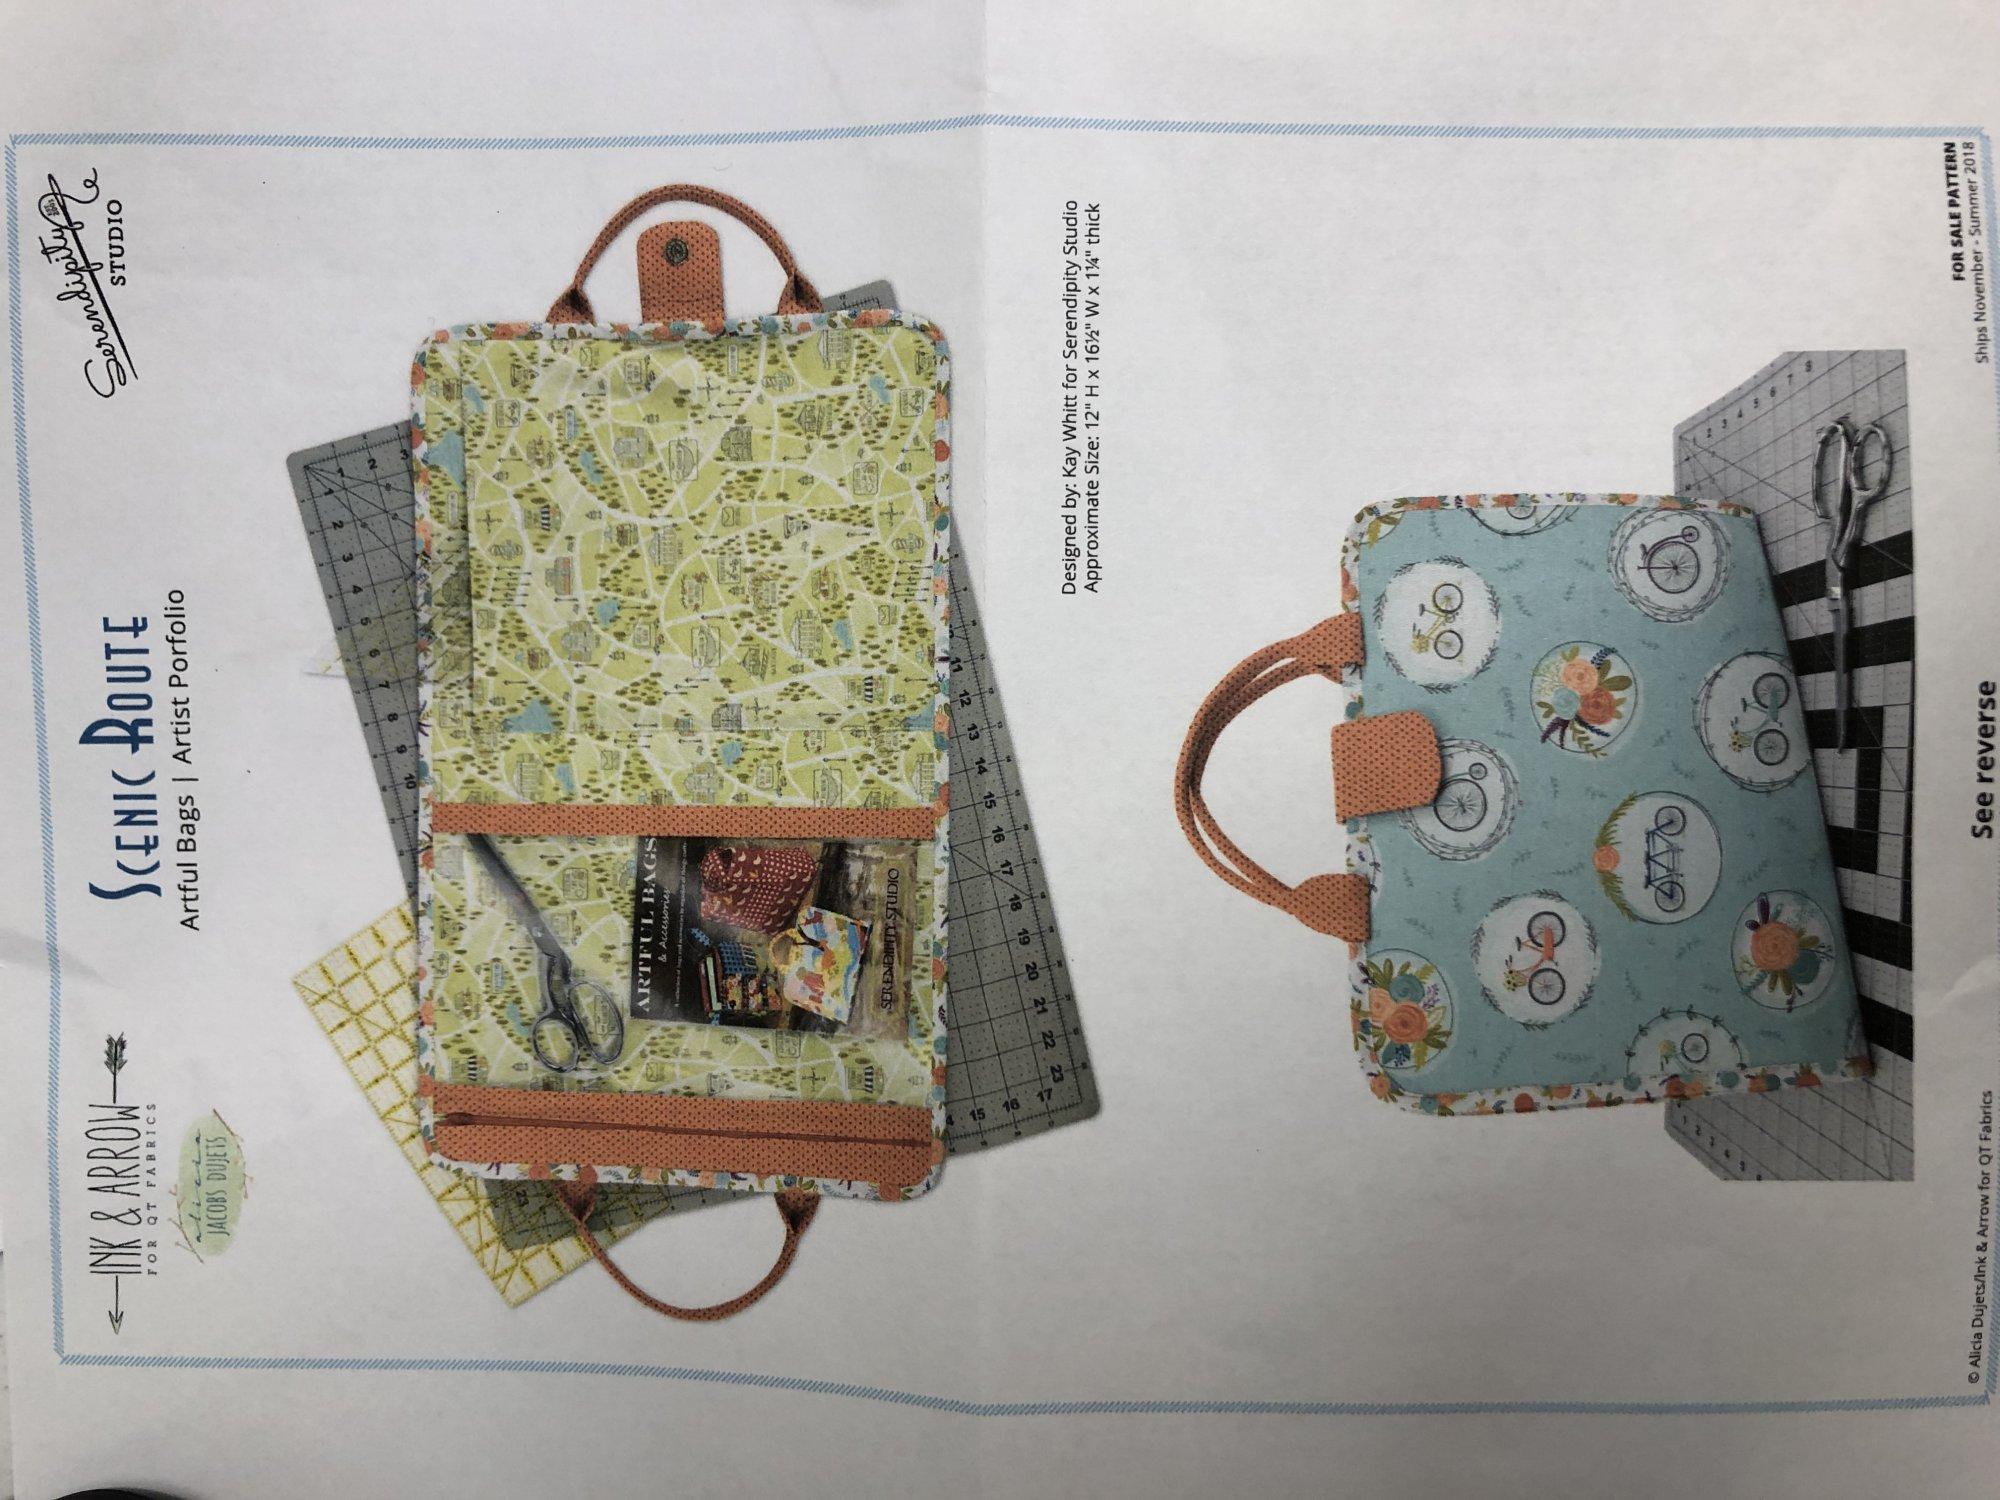 Artful Bag & Accessory Kit